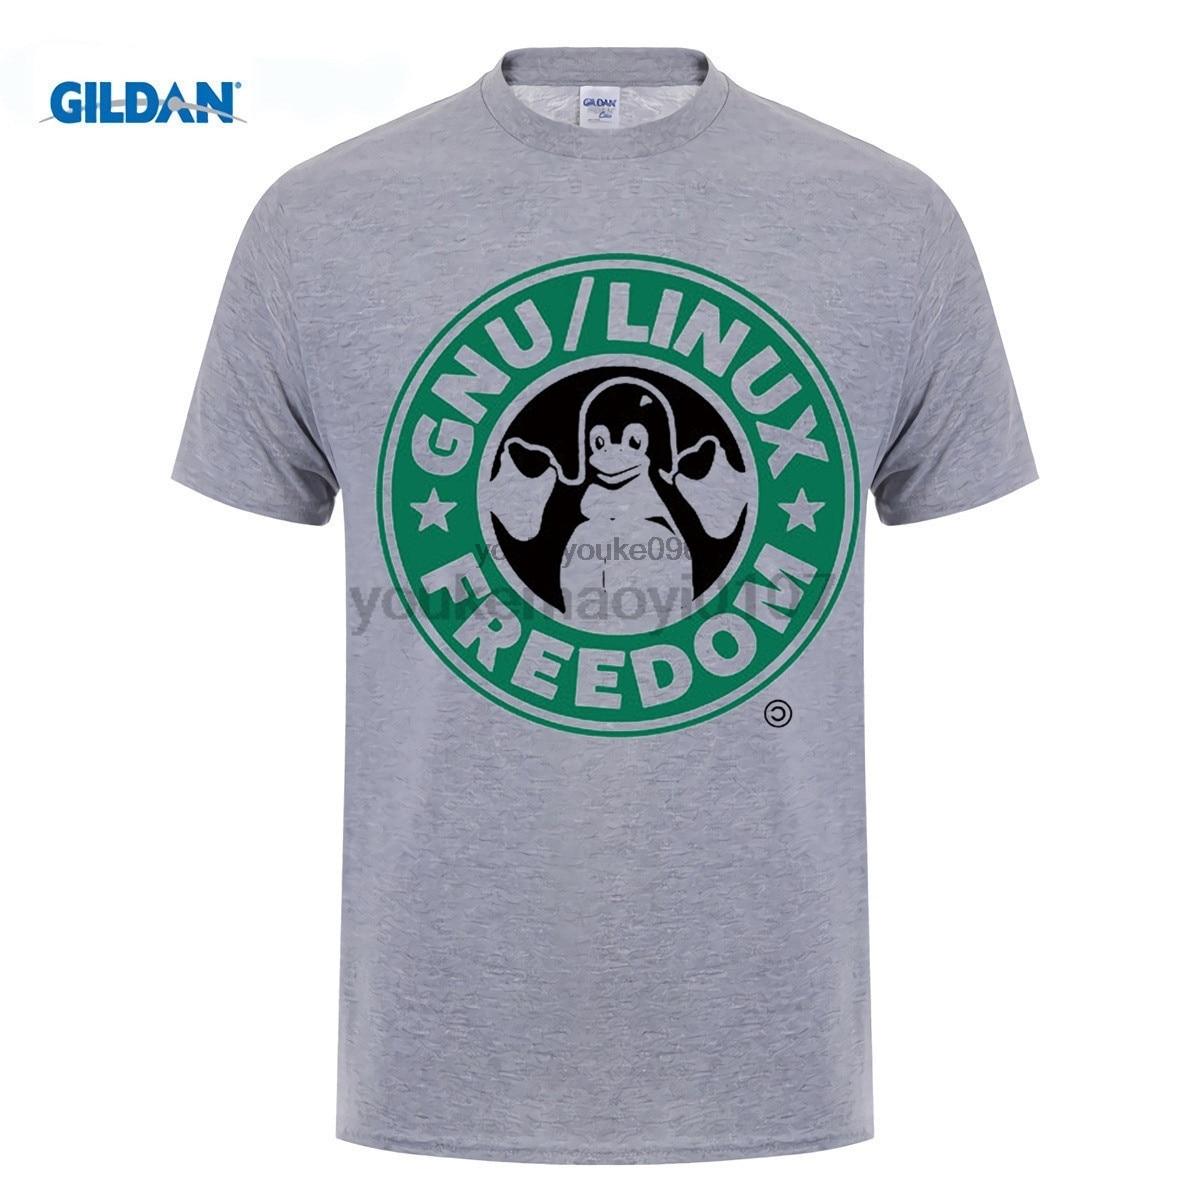 GILDAN designer t shirt GNU LINUX FREEDOM COFFEE PENGUINE T-shirt Top Lycra Cotton Men T shirt New Design High Quality